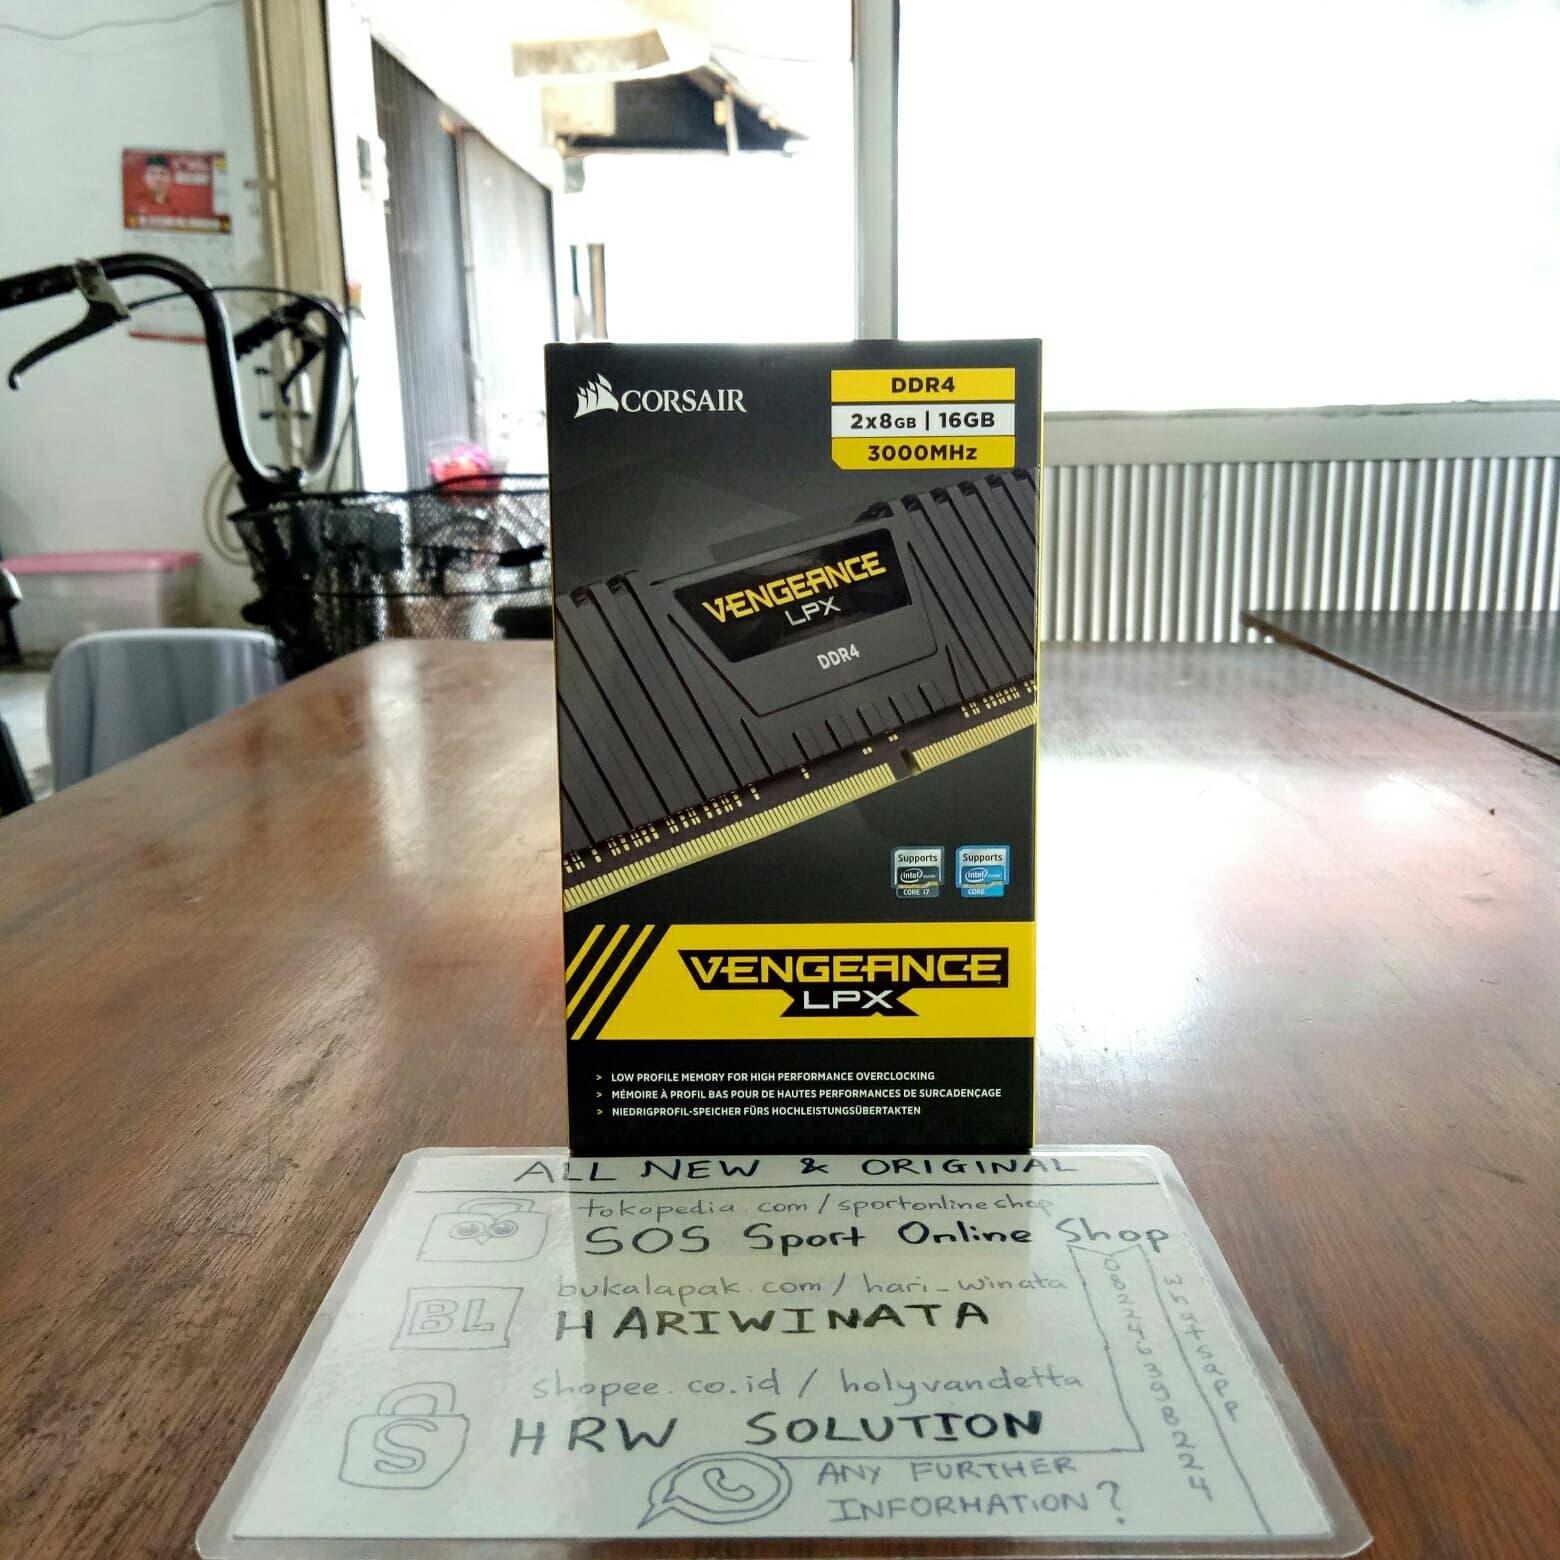 Jual Corsair DDR4 Vengeance LPX PC24000 16GB (2X8GB